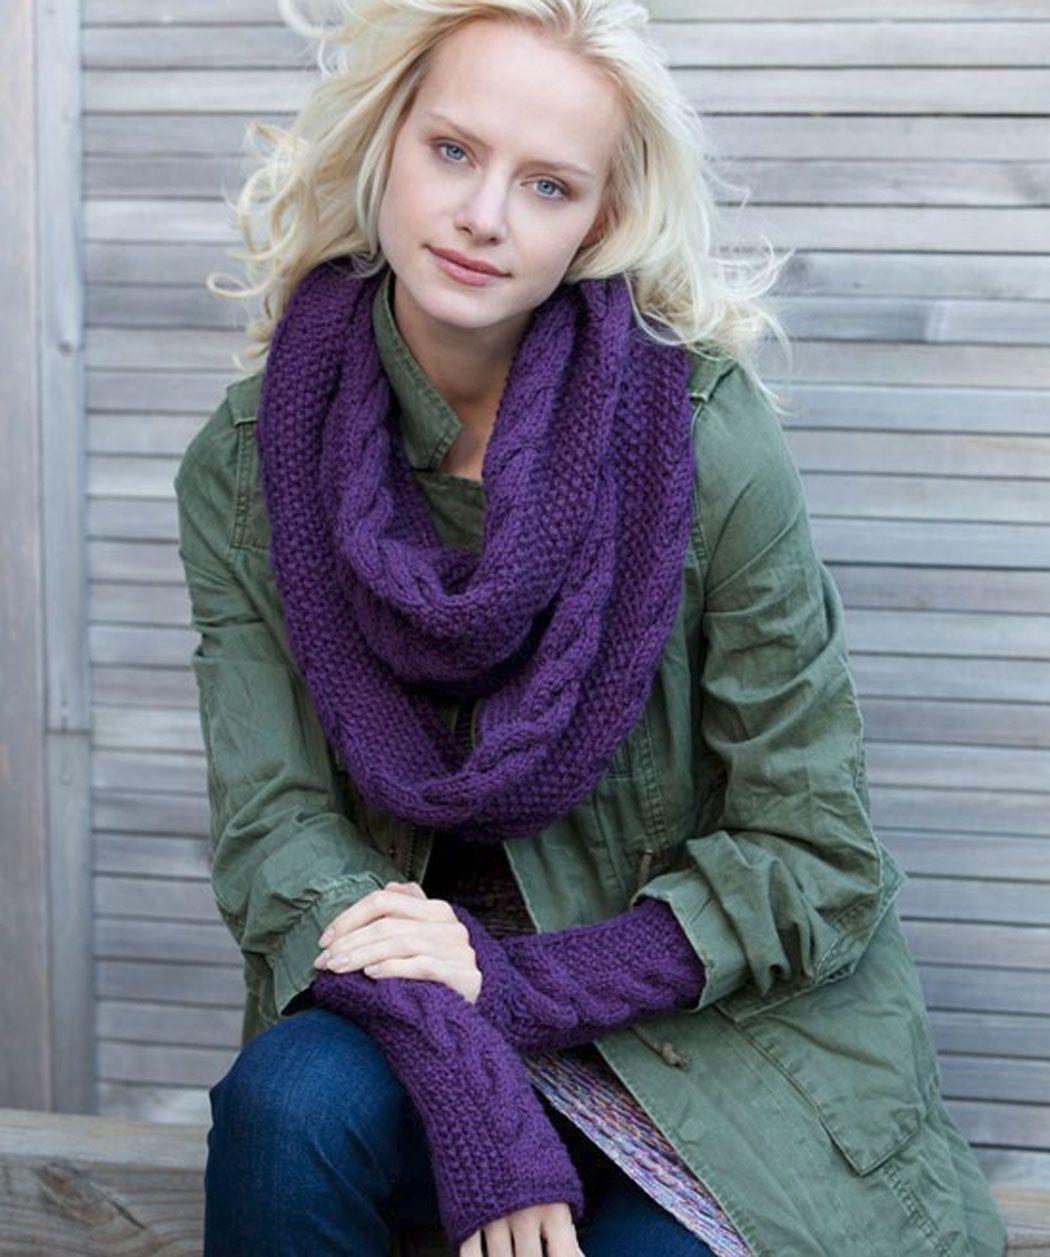 perlmuster zopf kombi knit handschuhe stricken schal. Black Bedroom Furniture Sets. Home Design Ideas